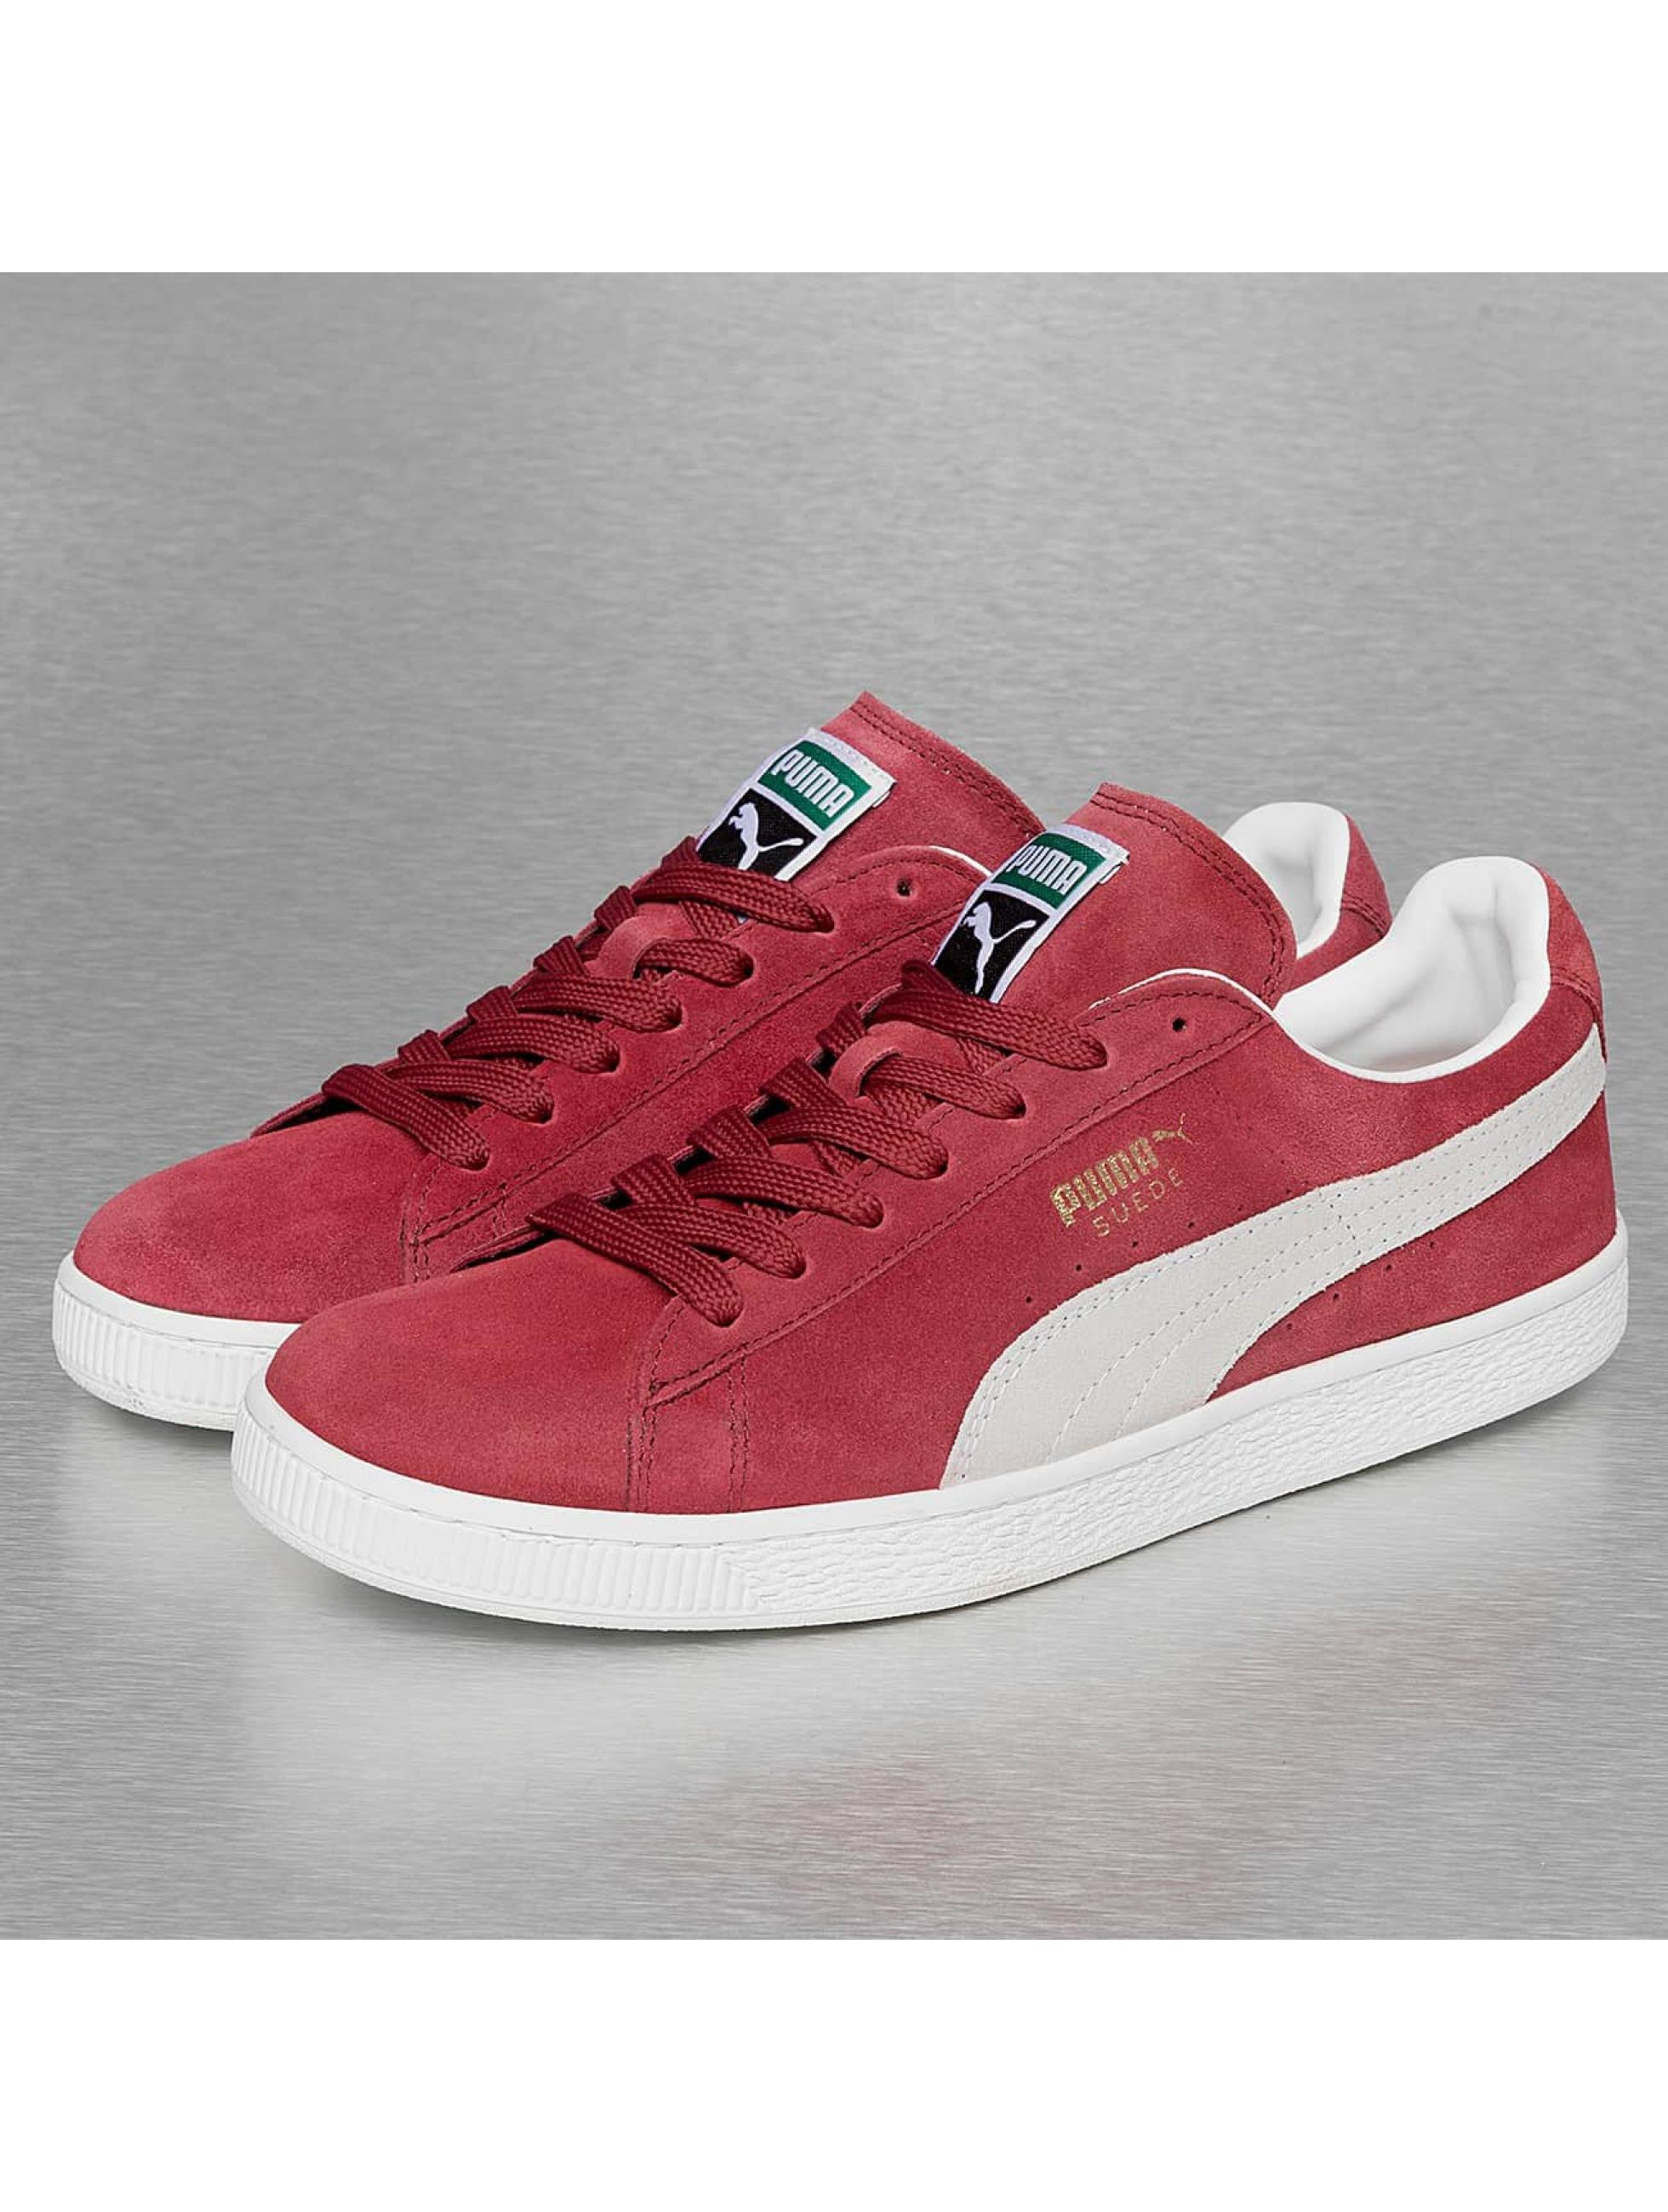 Puma Schoenen Helemaal Rood